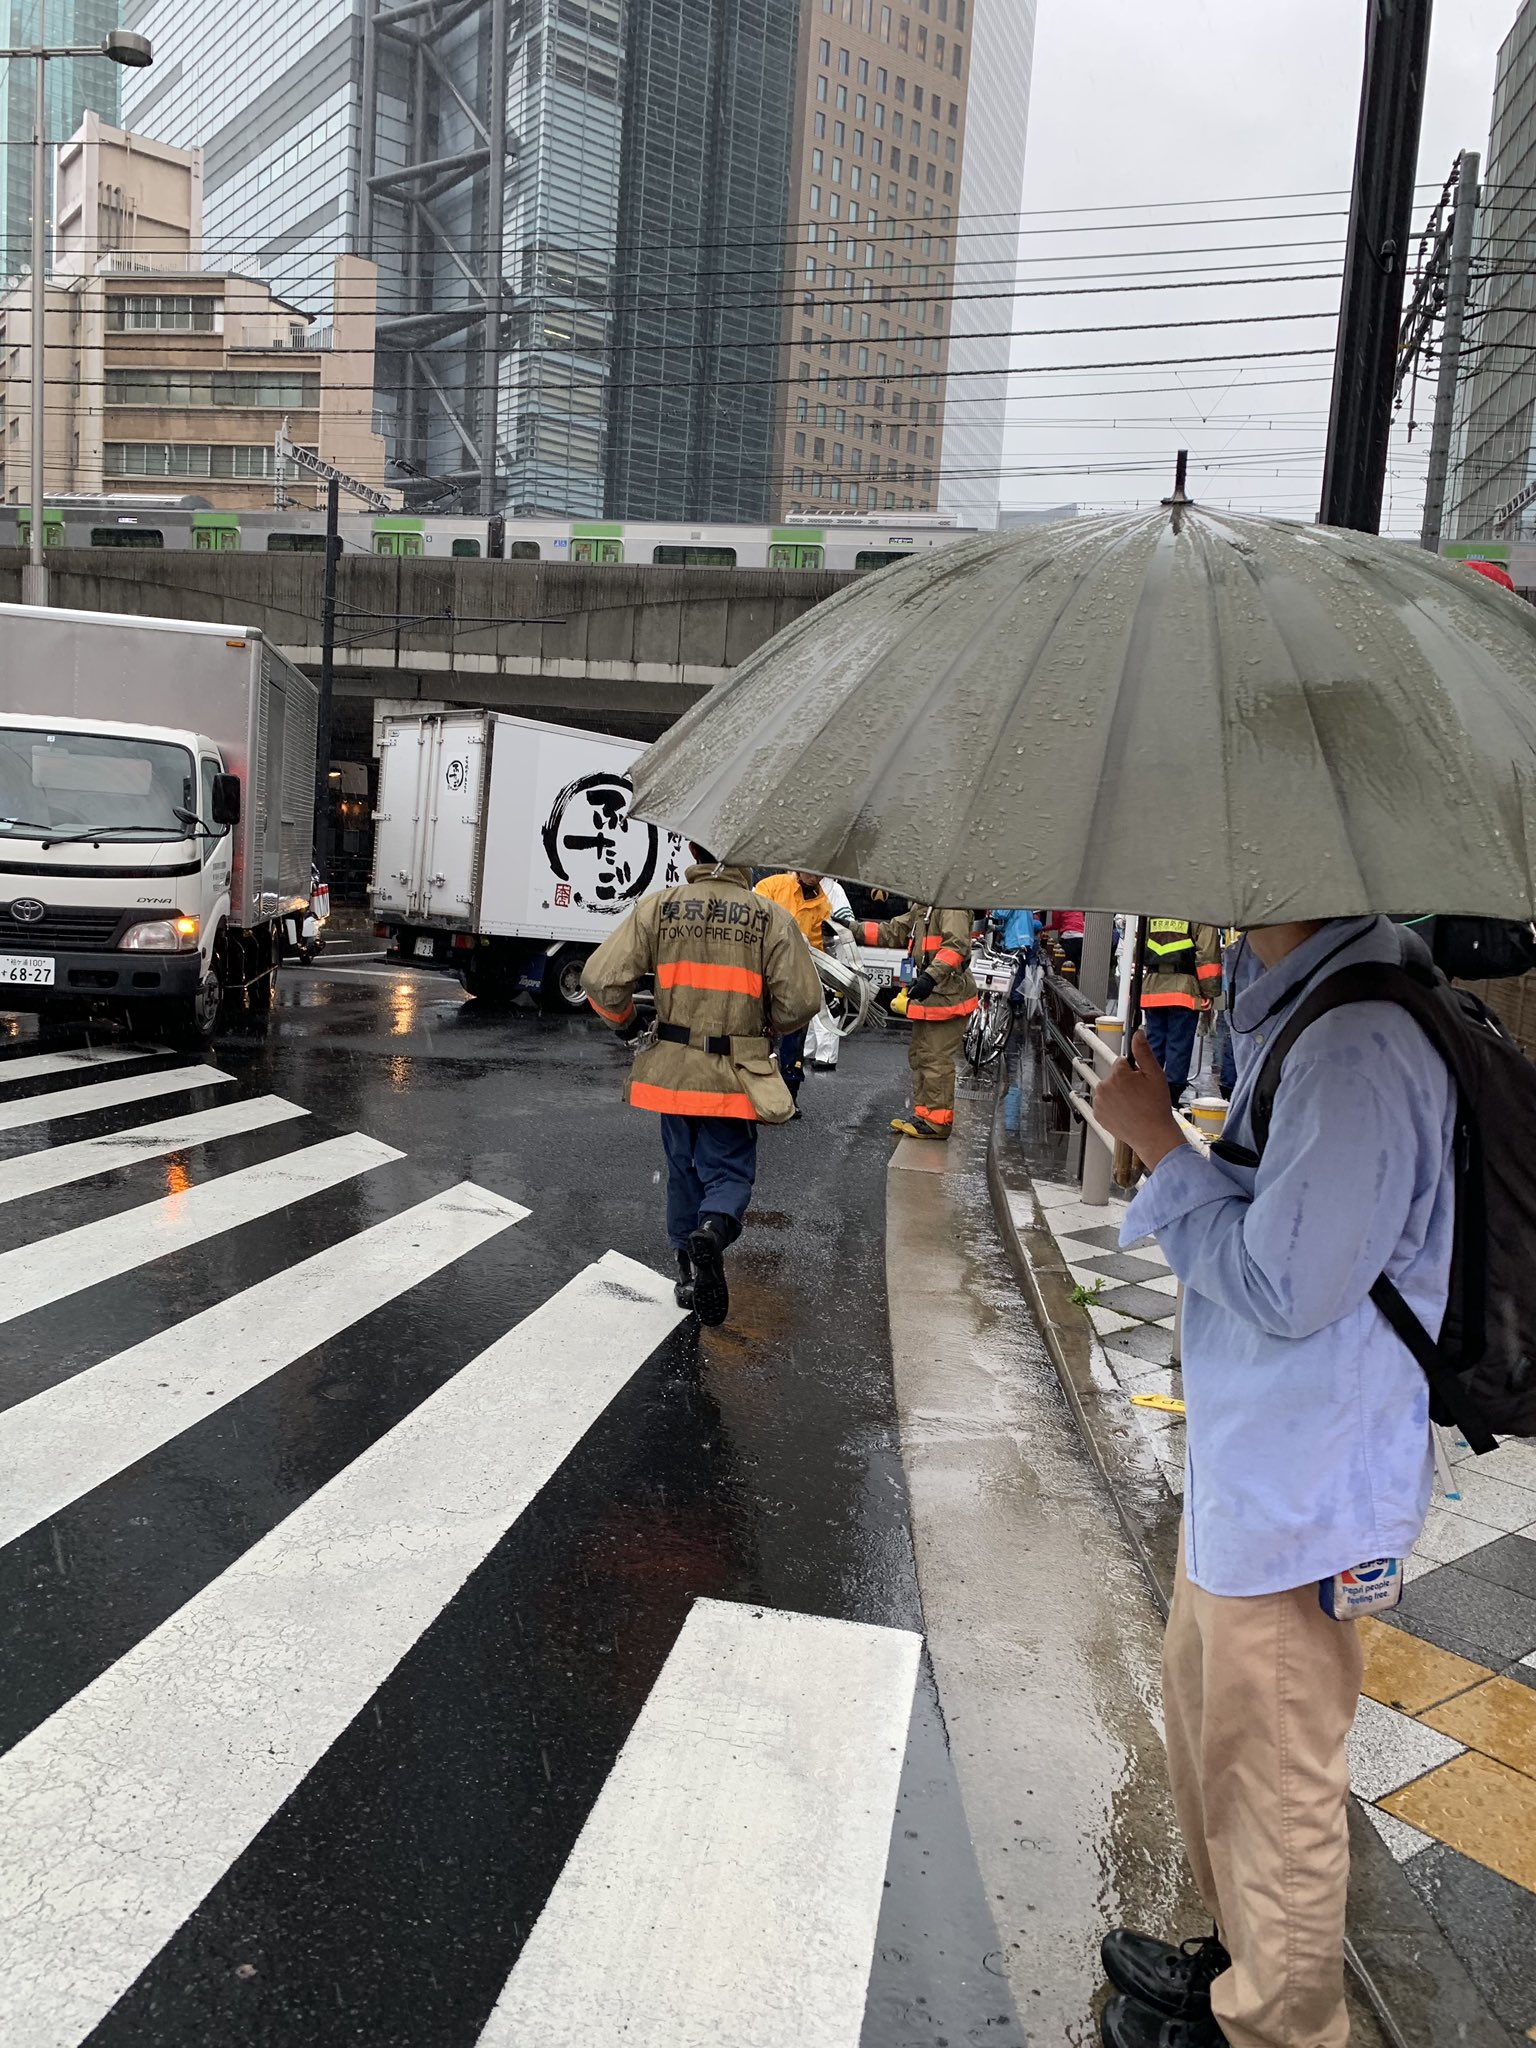 JR新橋駅付近の衝突事故で救出活動している現場画像